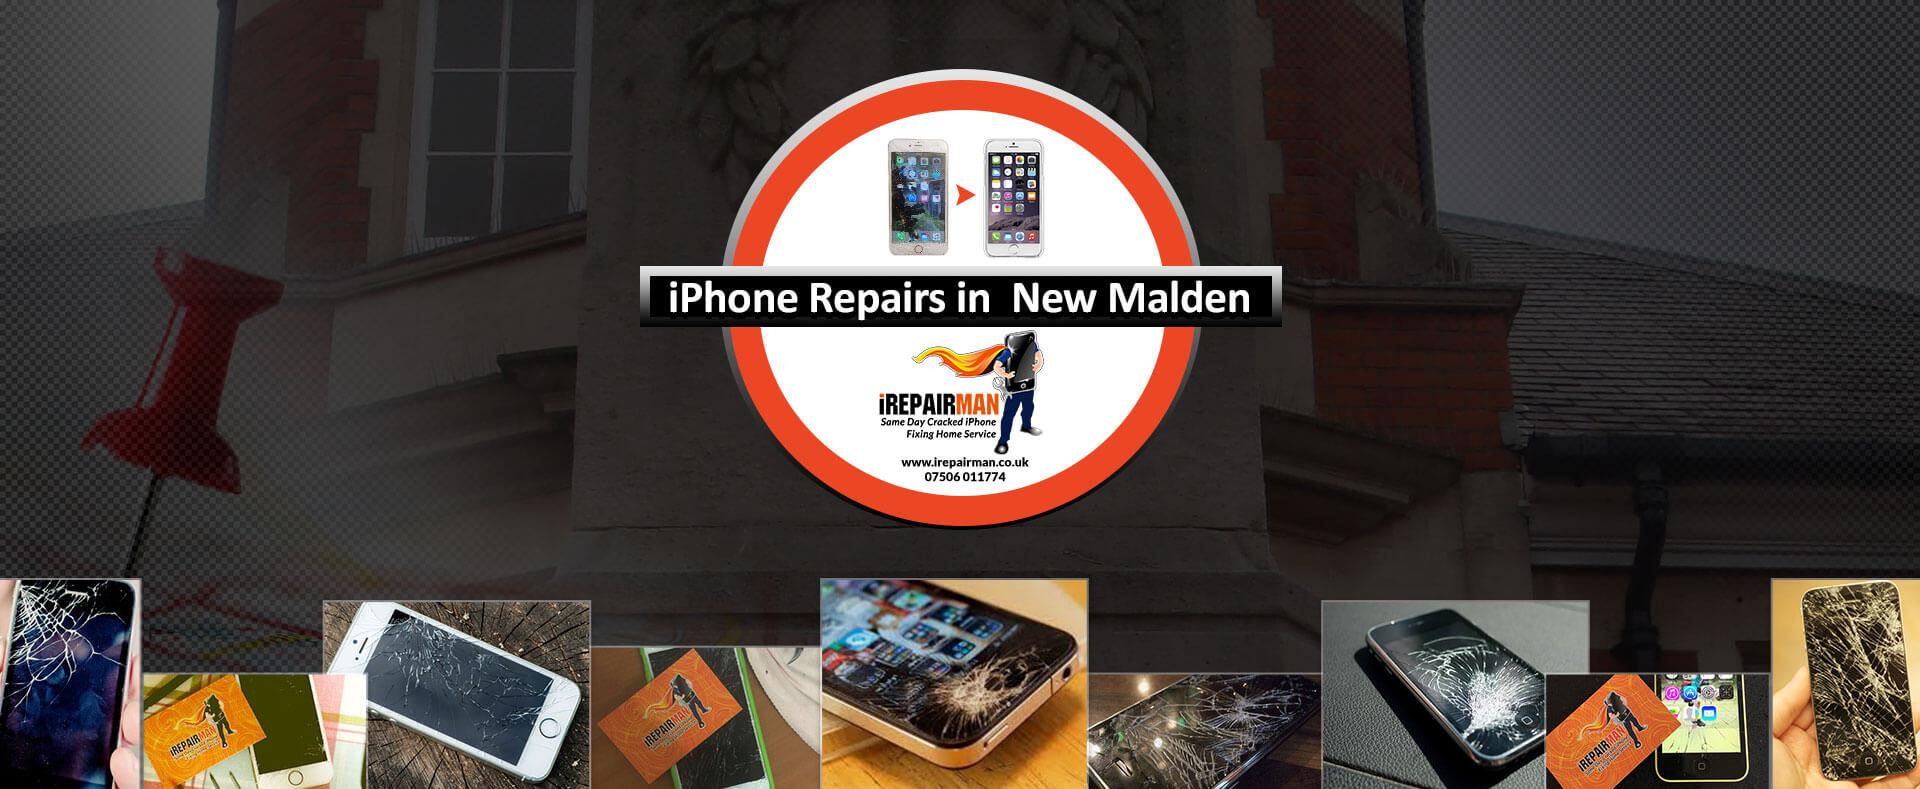 iPhone Repairs in New Malden